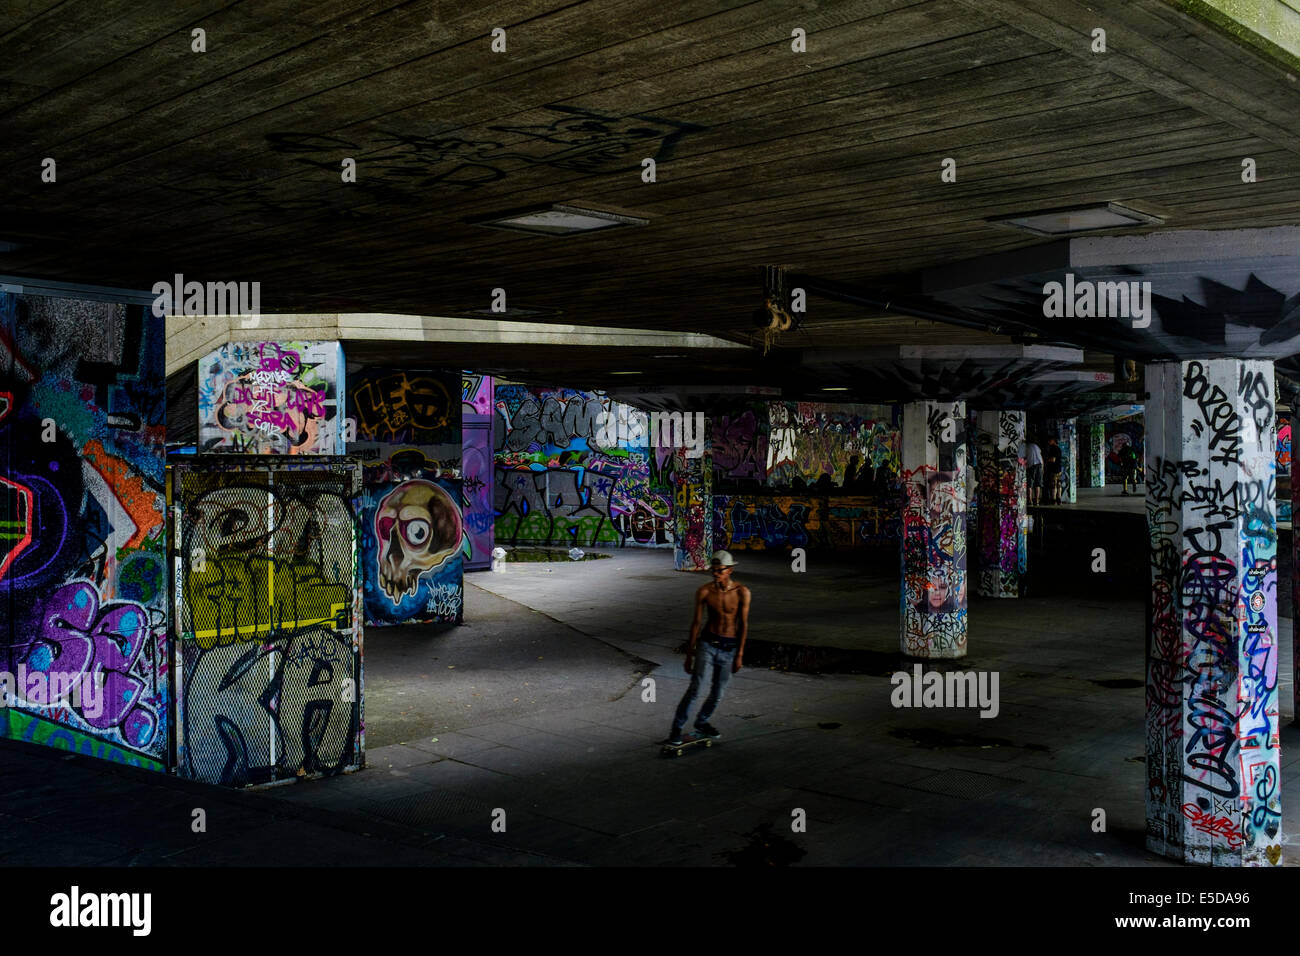 London urban photography: Lone skater at the Southbank skatepark, London, UK - Stock Image